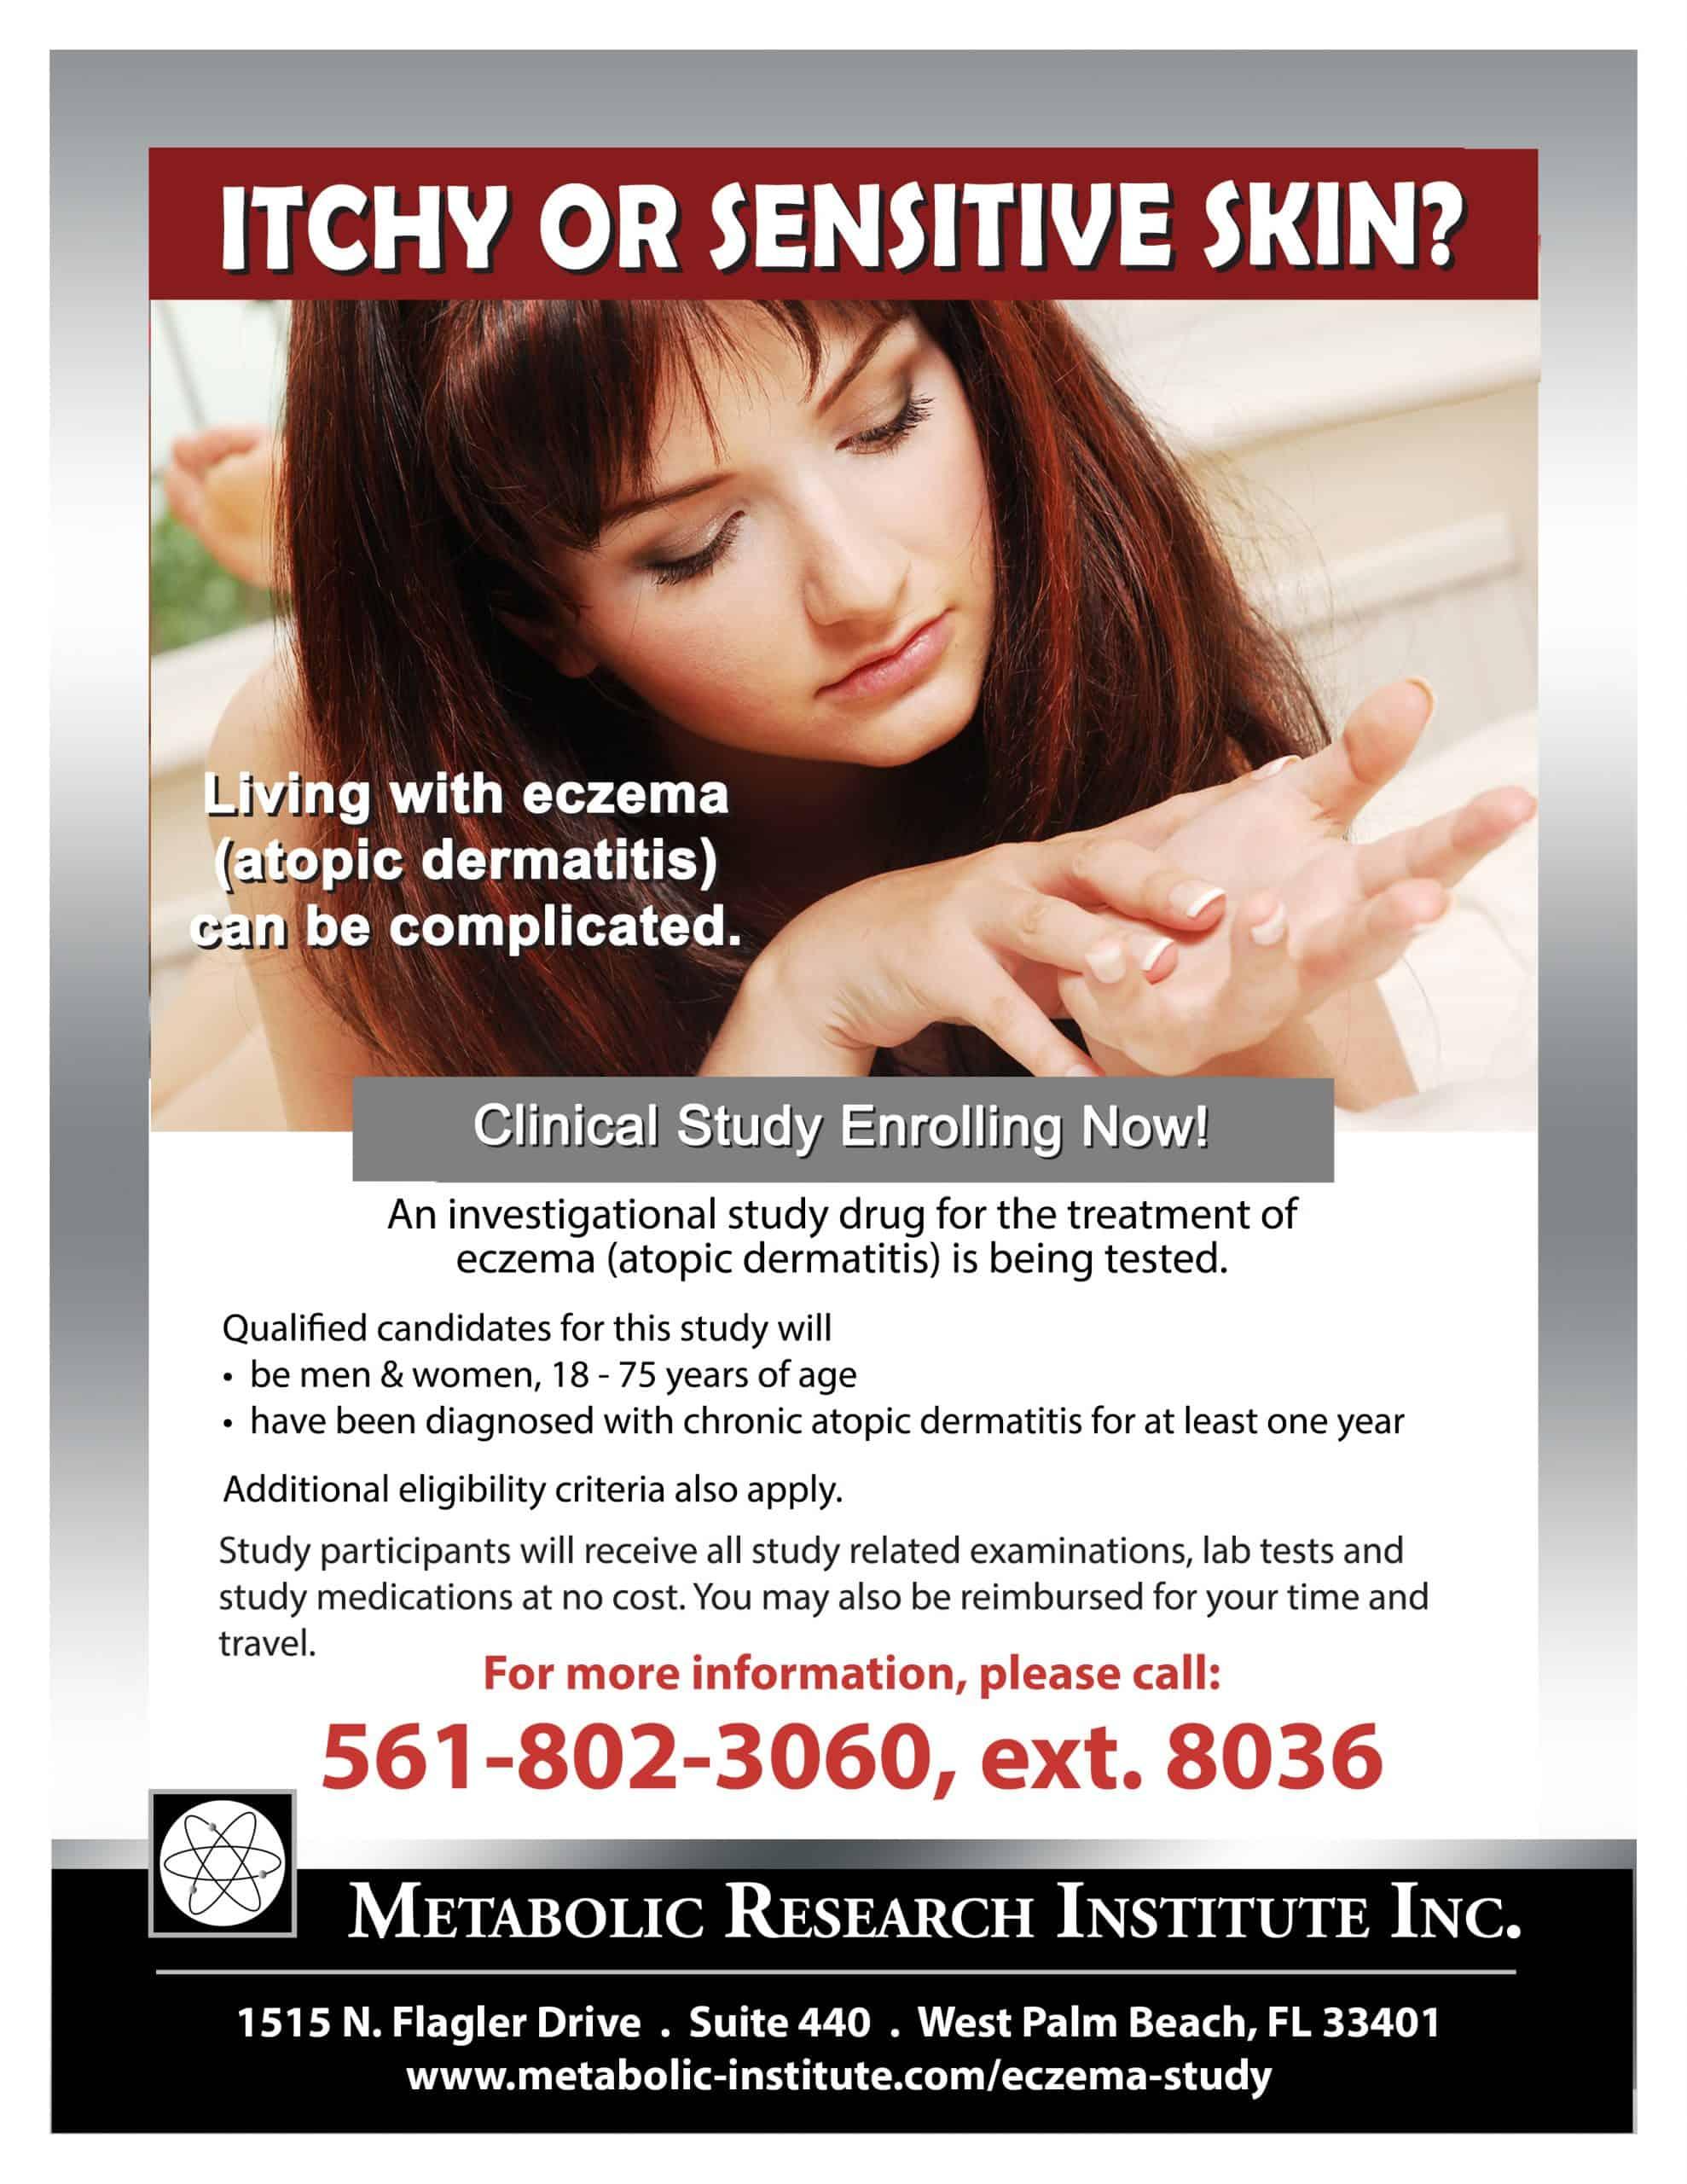 Eczema (Atopic Dermatitis) Clinical Study flyer